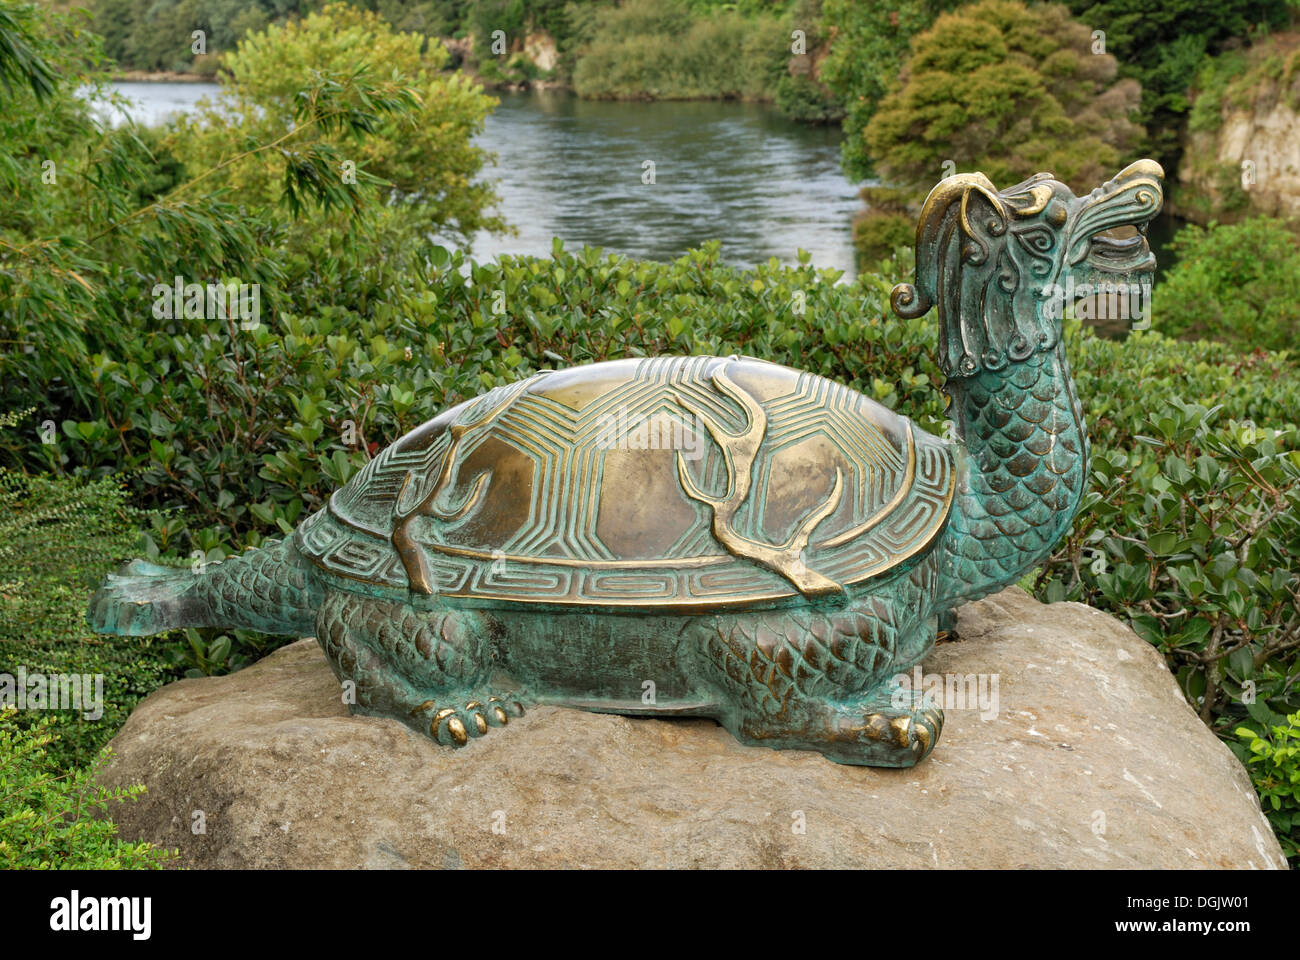 Bronze turtle, mythical creatures, Japanese Garden of Contemplation, Hamilton Gardens on the Waikato River, Hamilton - Stock Image